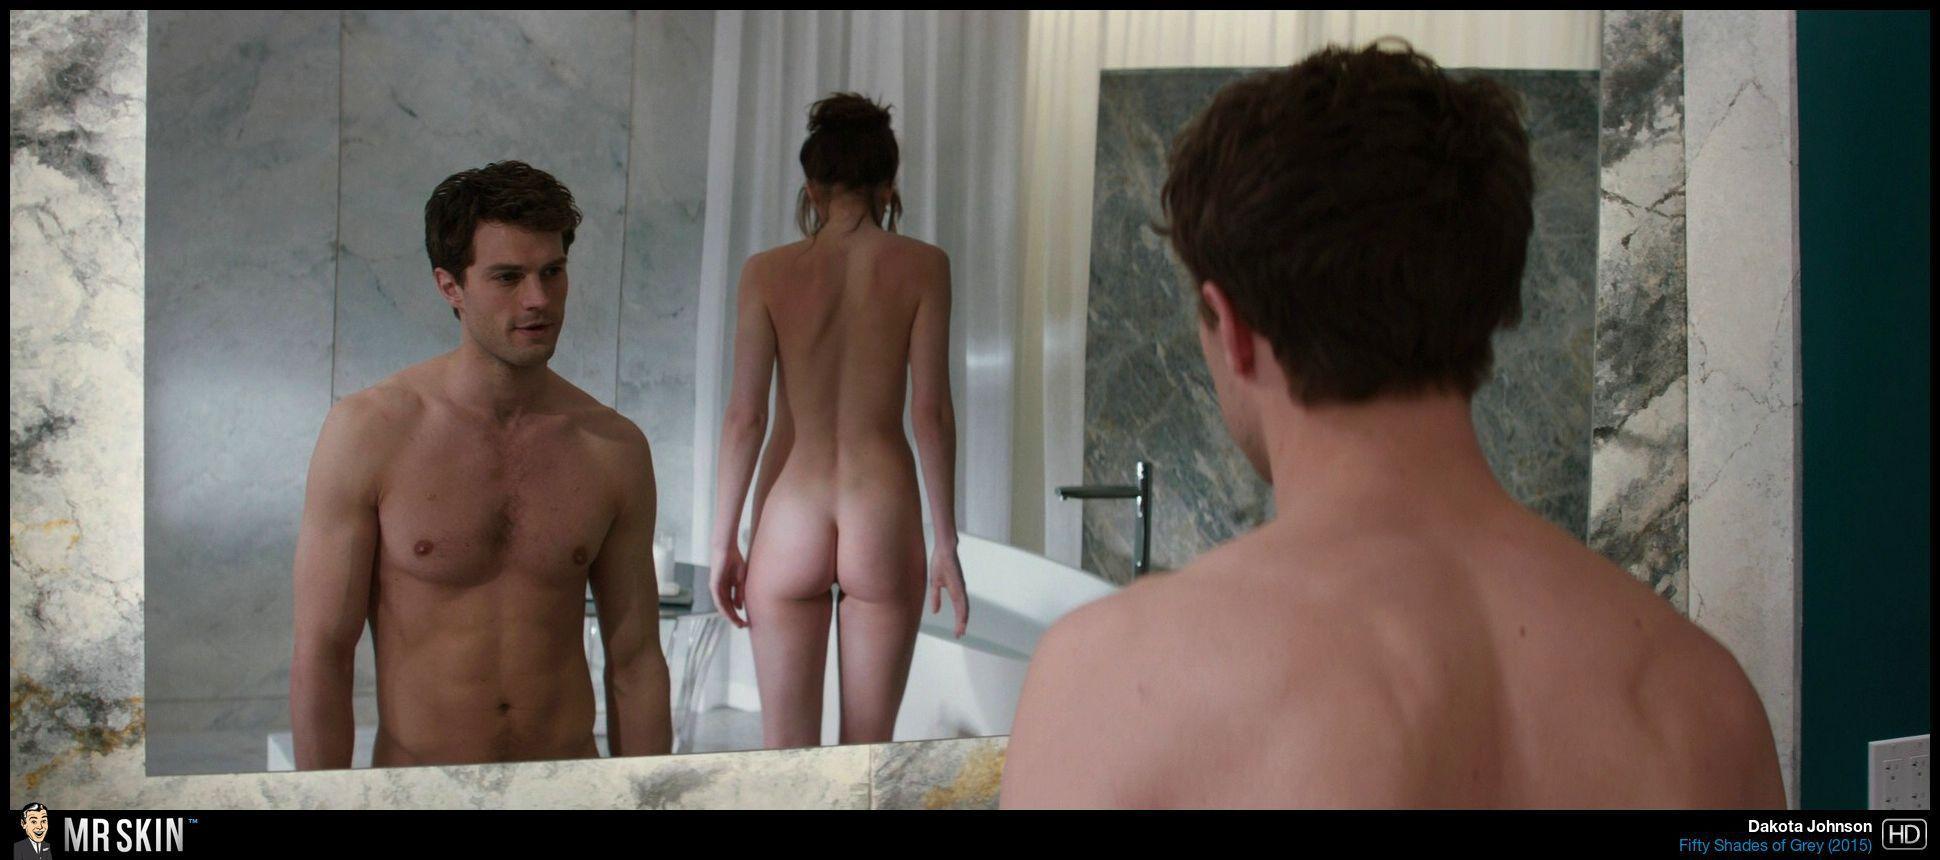 Tilda swinton nude new images